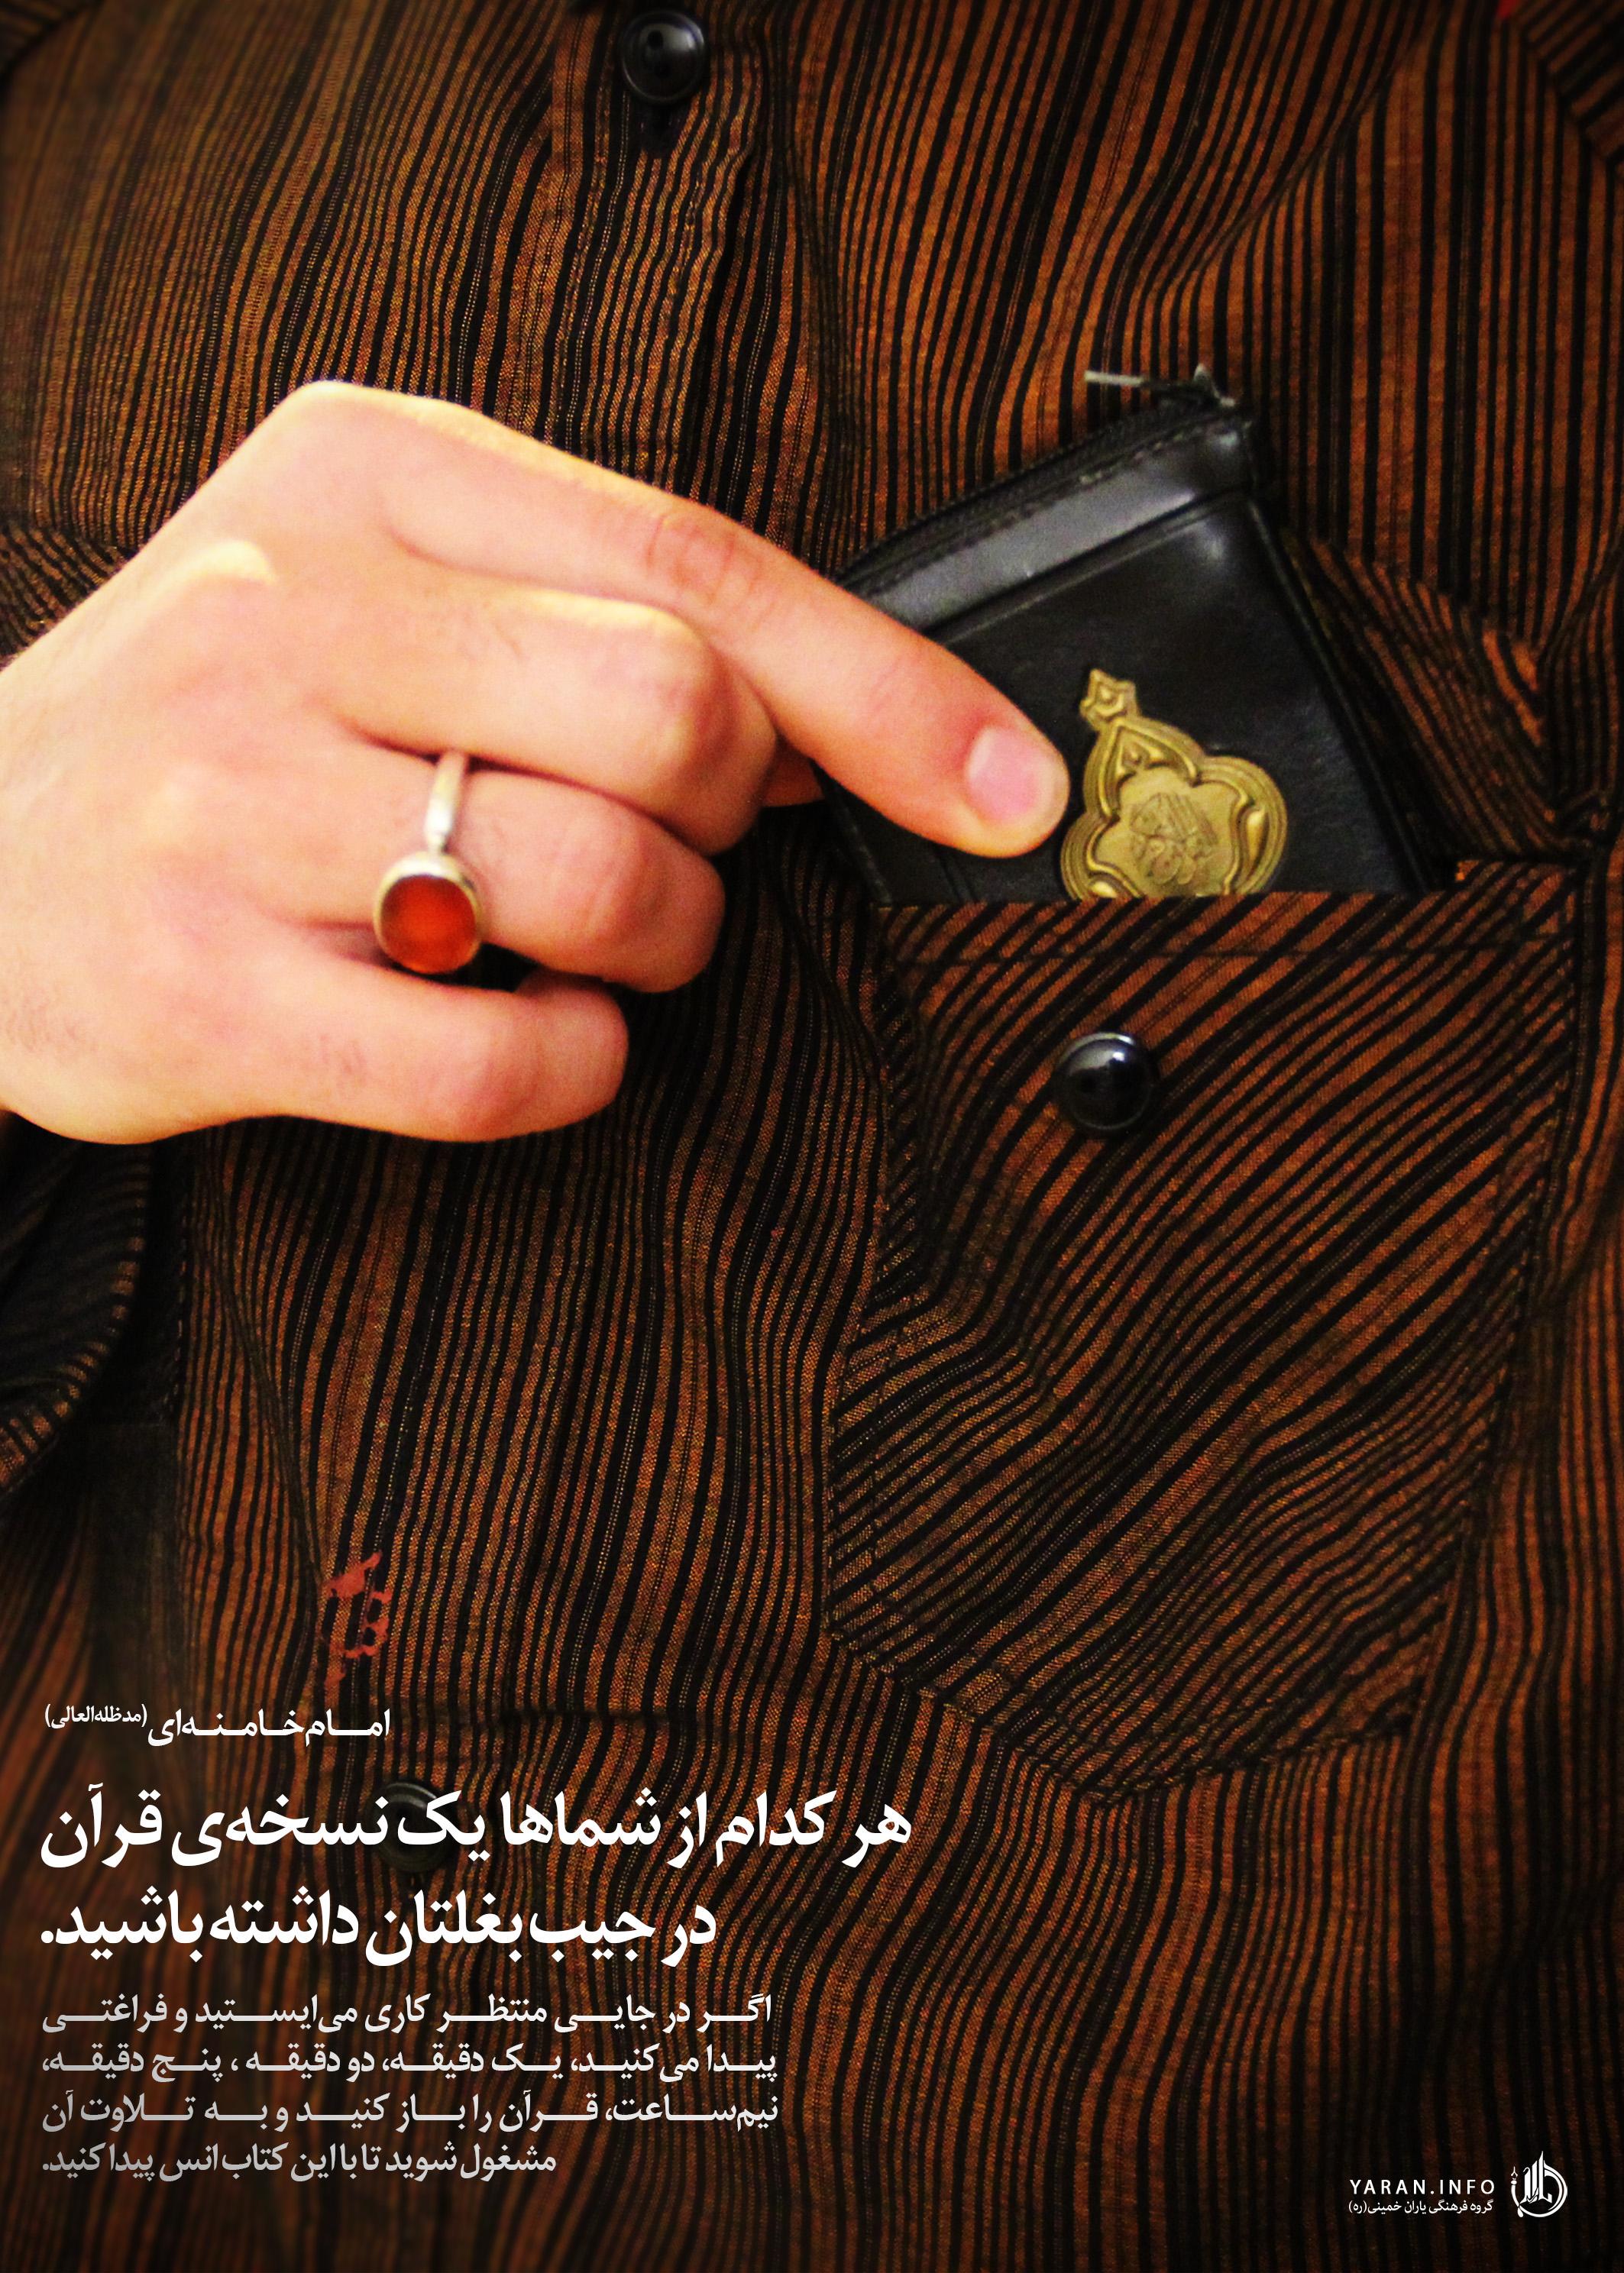 http://bayanbox.ir/id/5148583566439930740?view